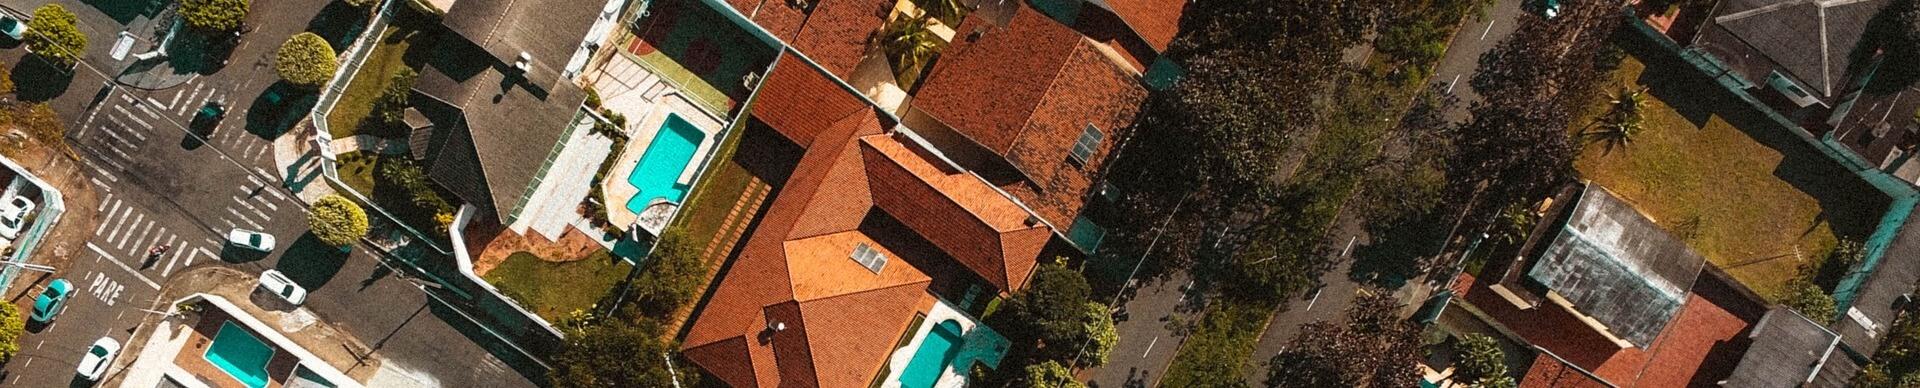 Wohngebiet aus Vogelperspektive fotografiert